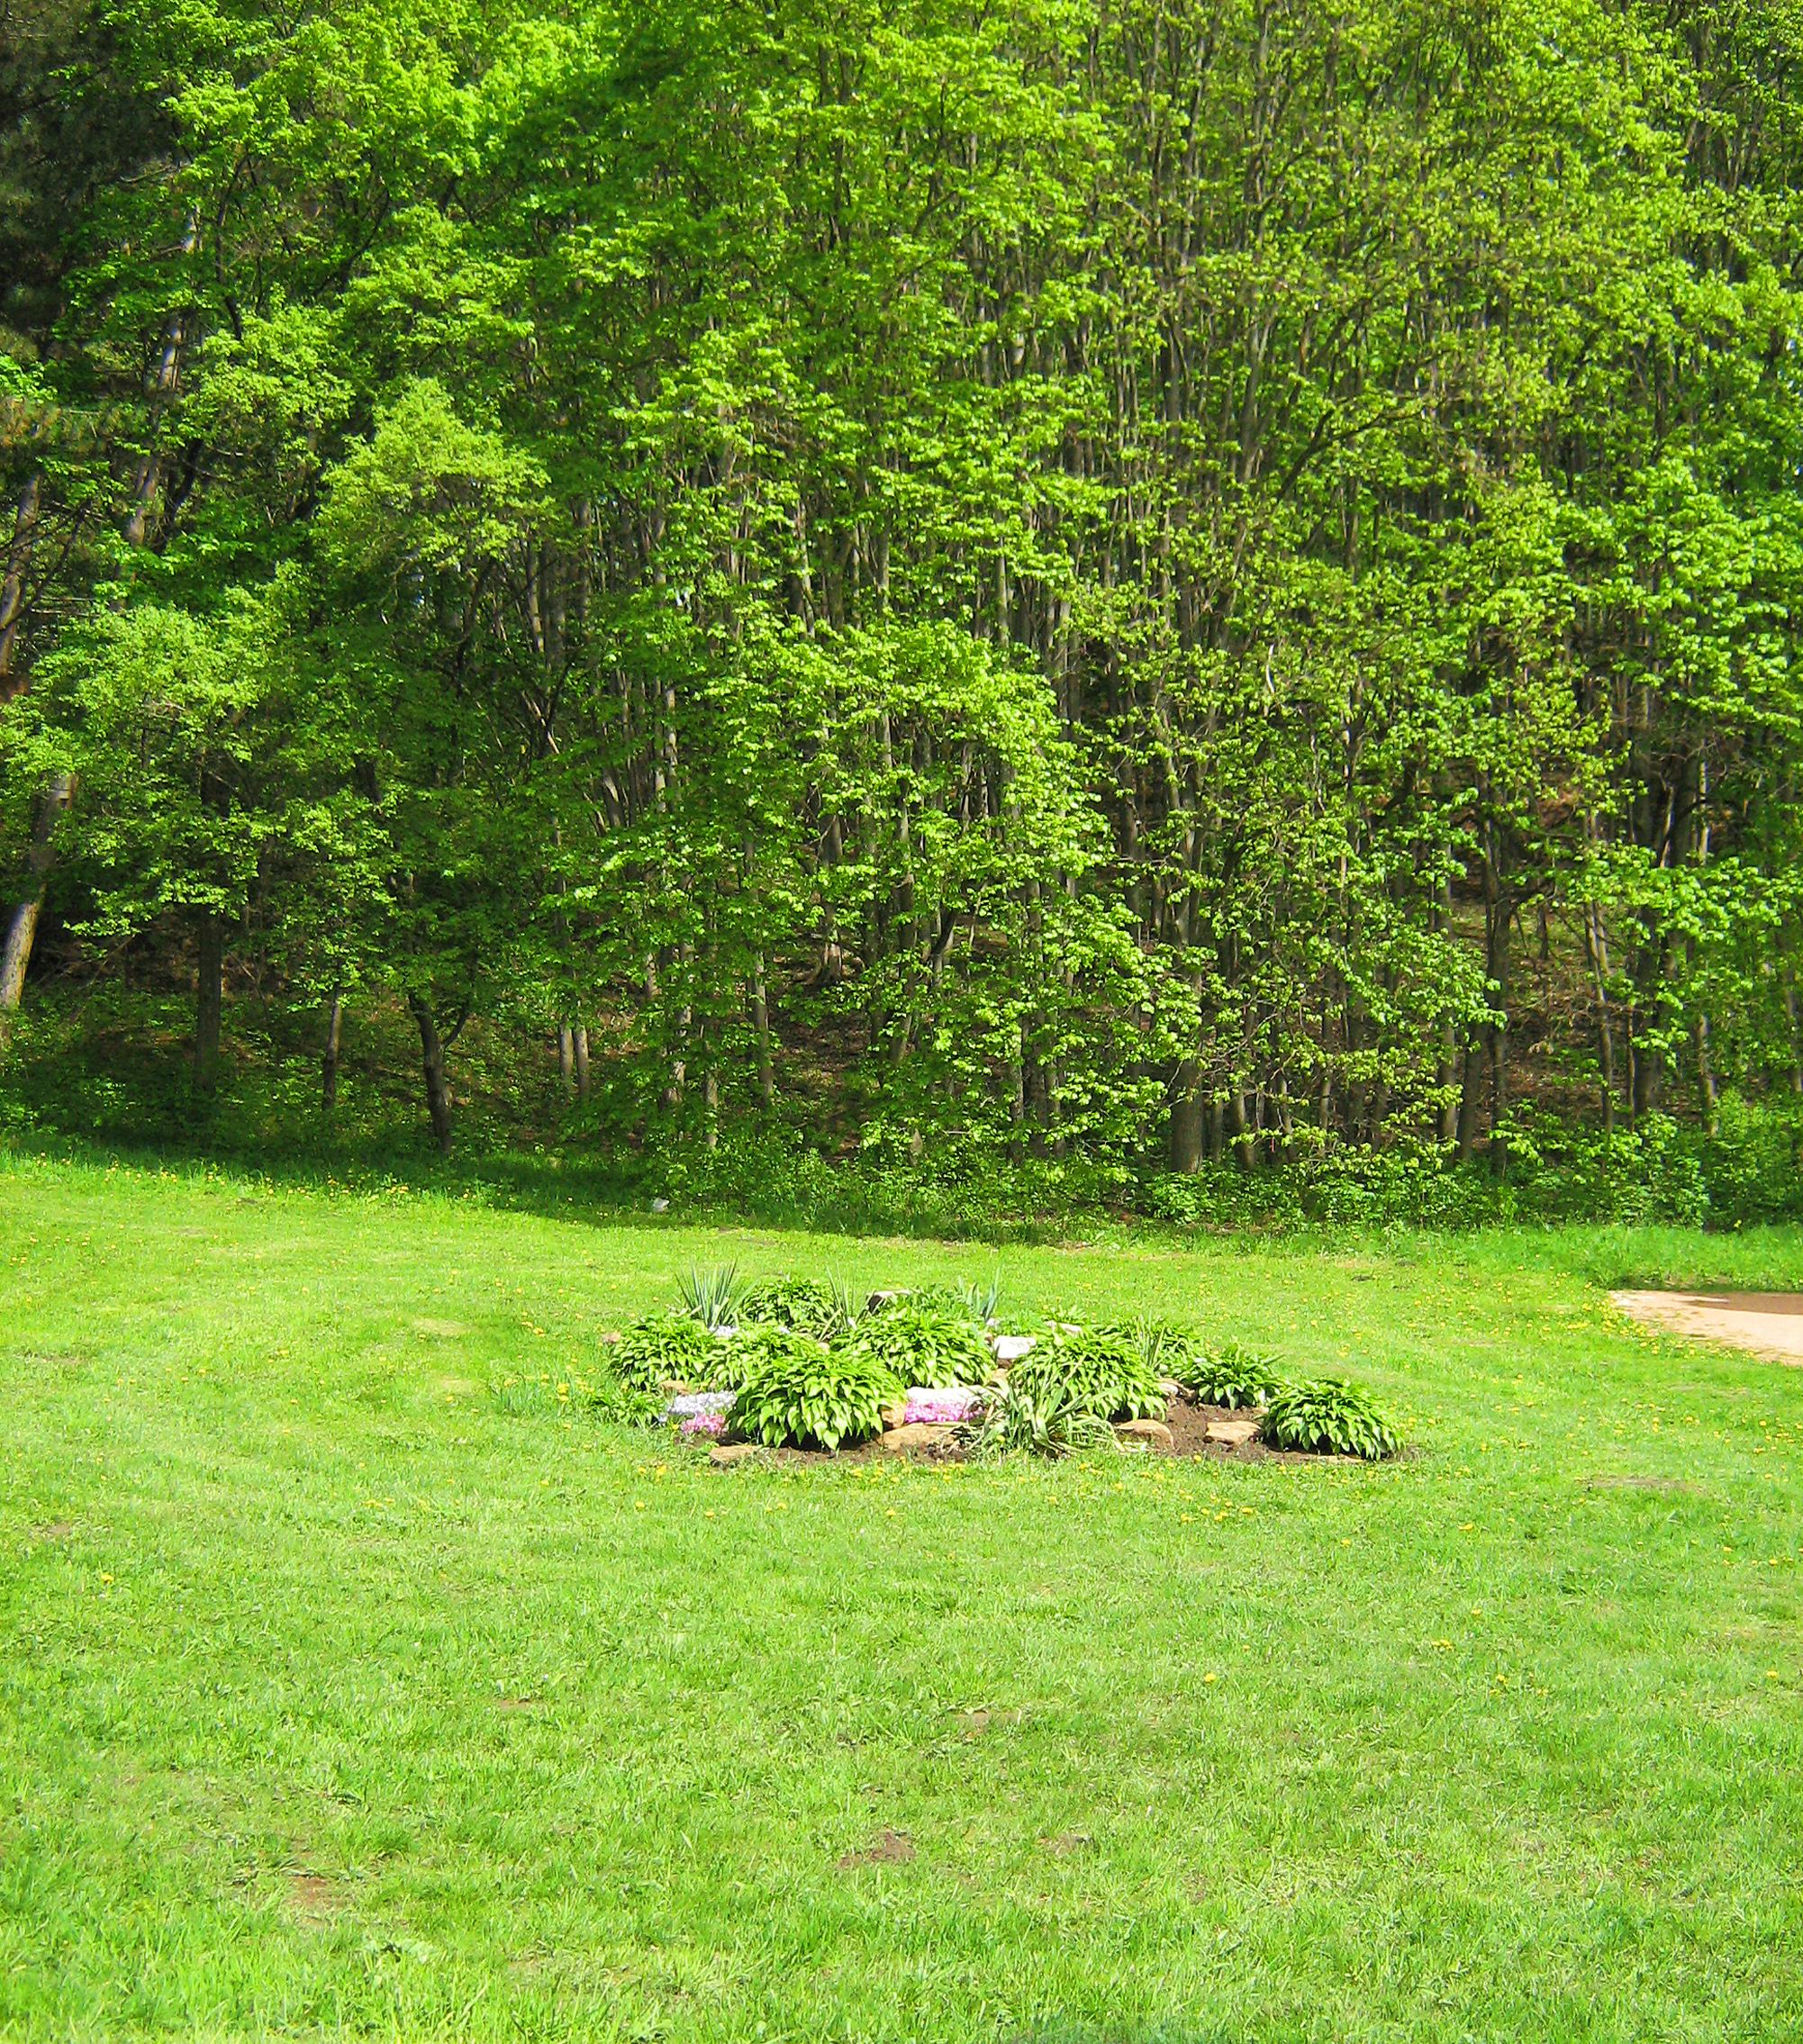 grass field, Sunshine, Leaf, Summer, Spring, HQ Photo